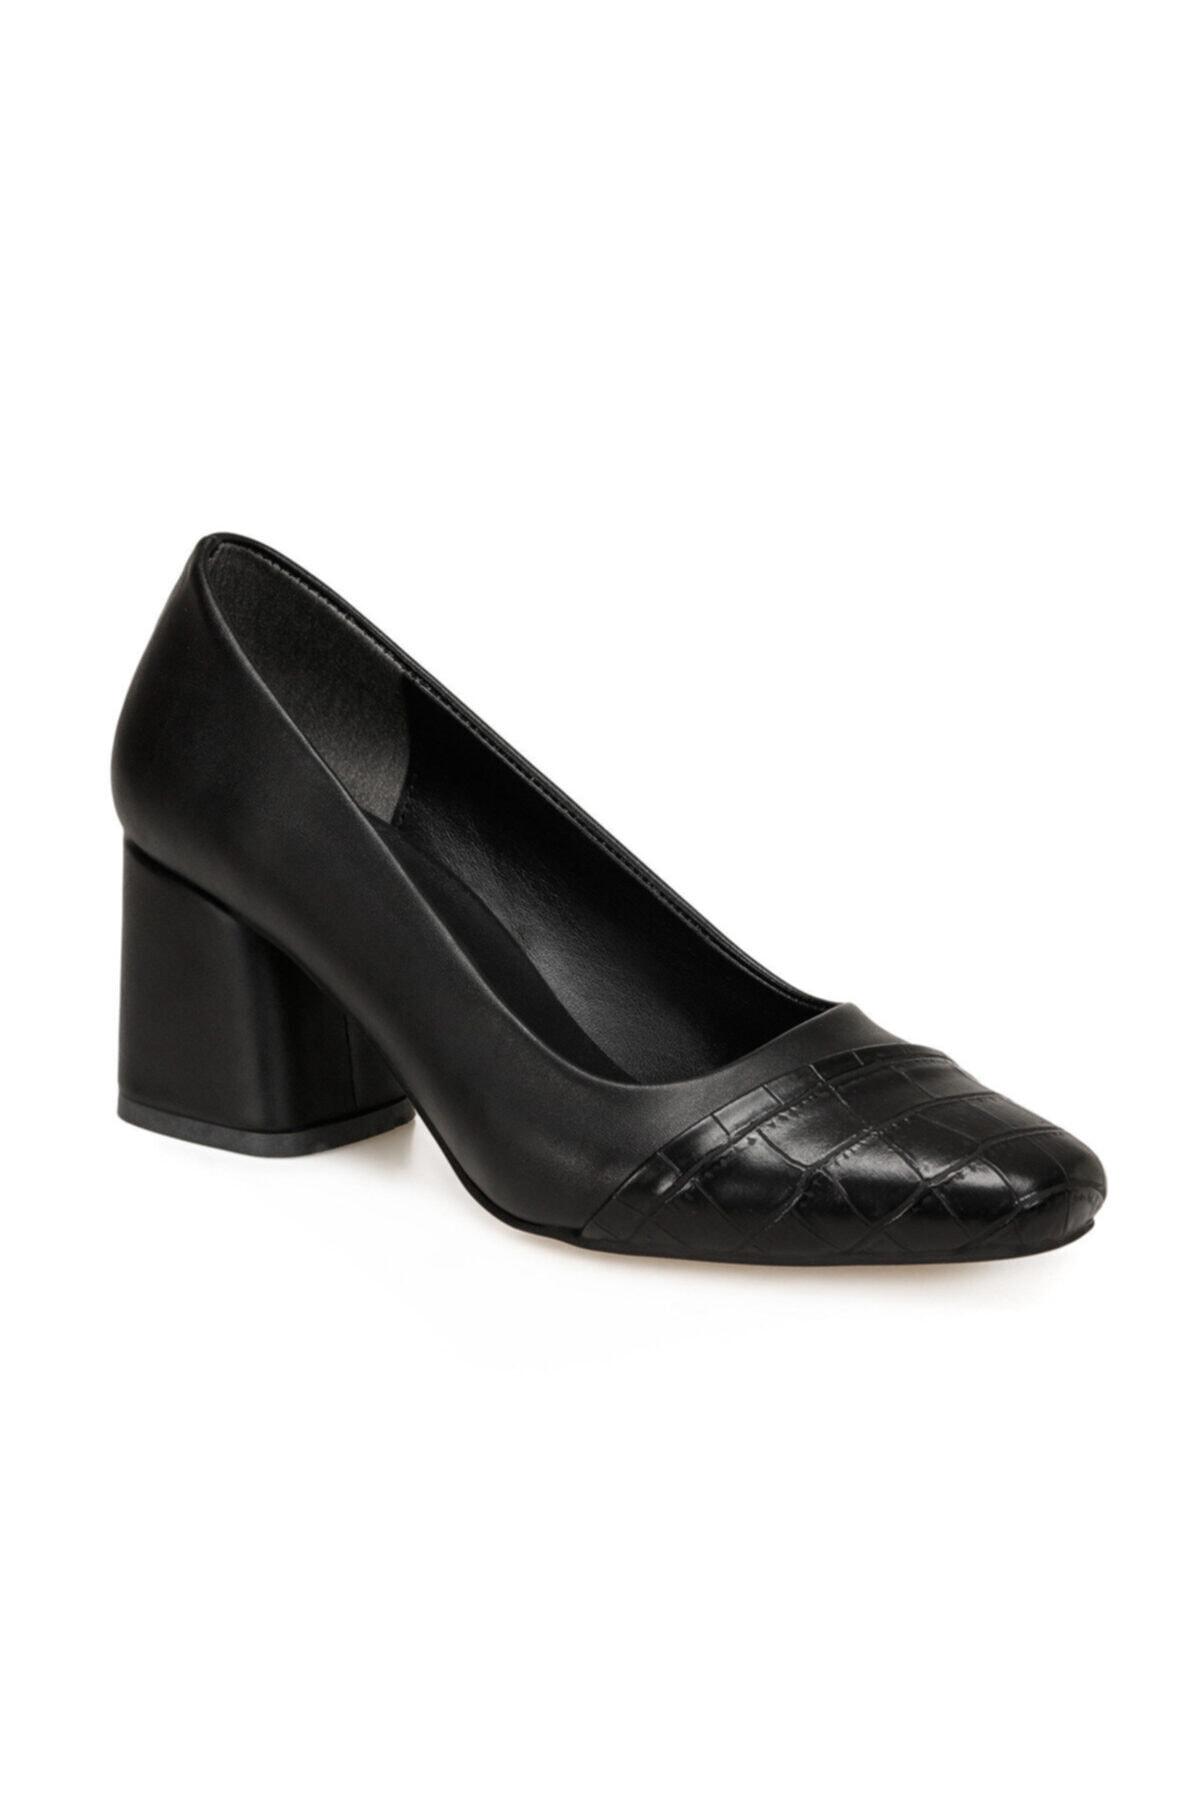 Butigo LİLY Siyah Kadın Topuklu Ayakkabı 100666957 1